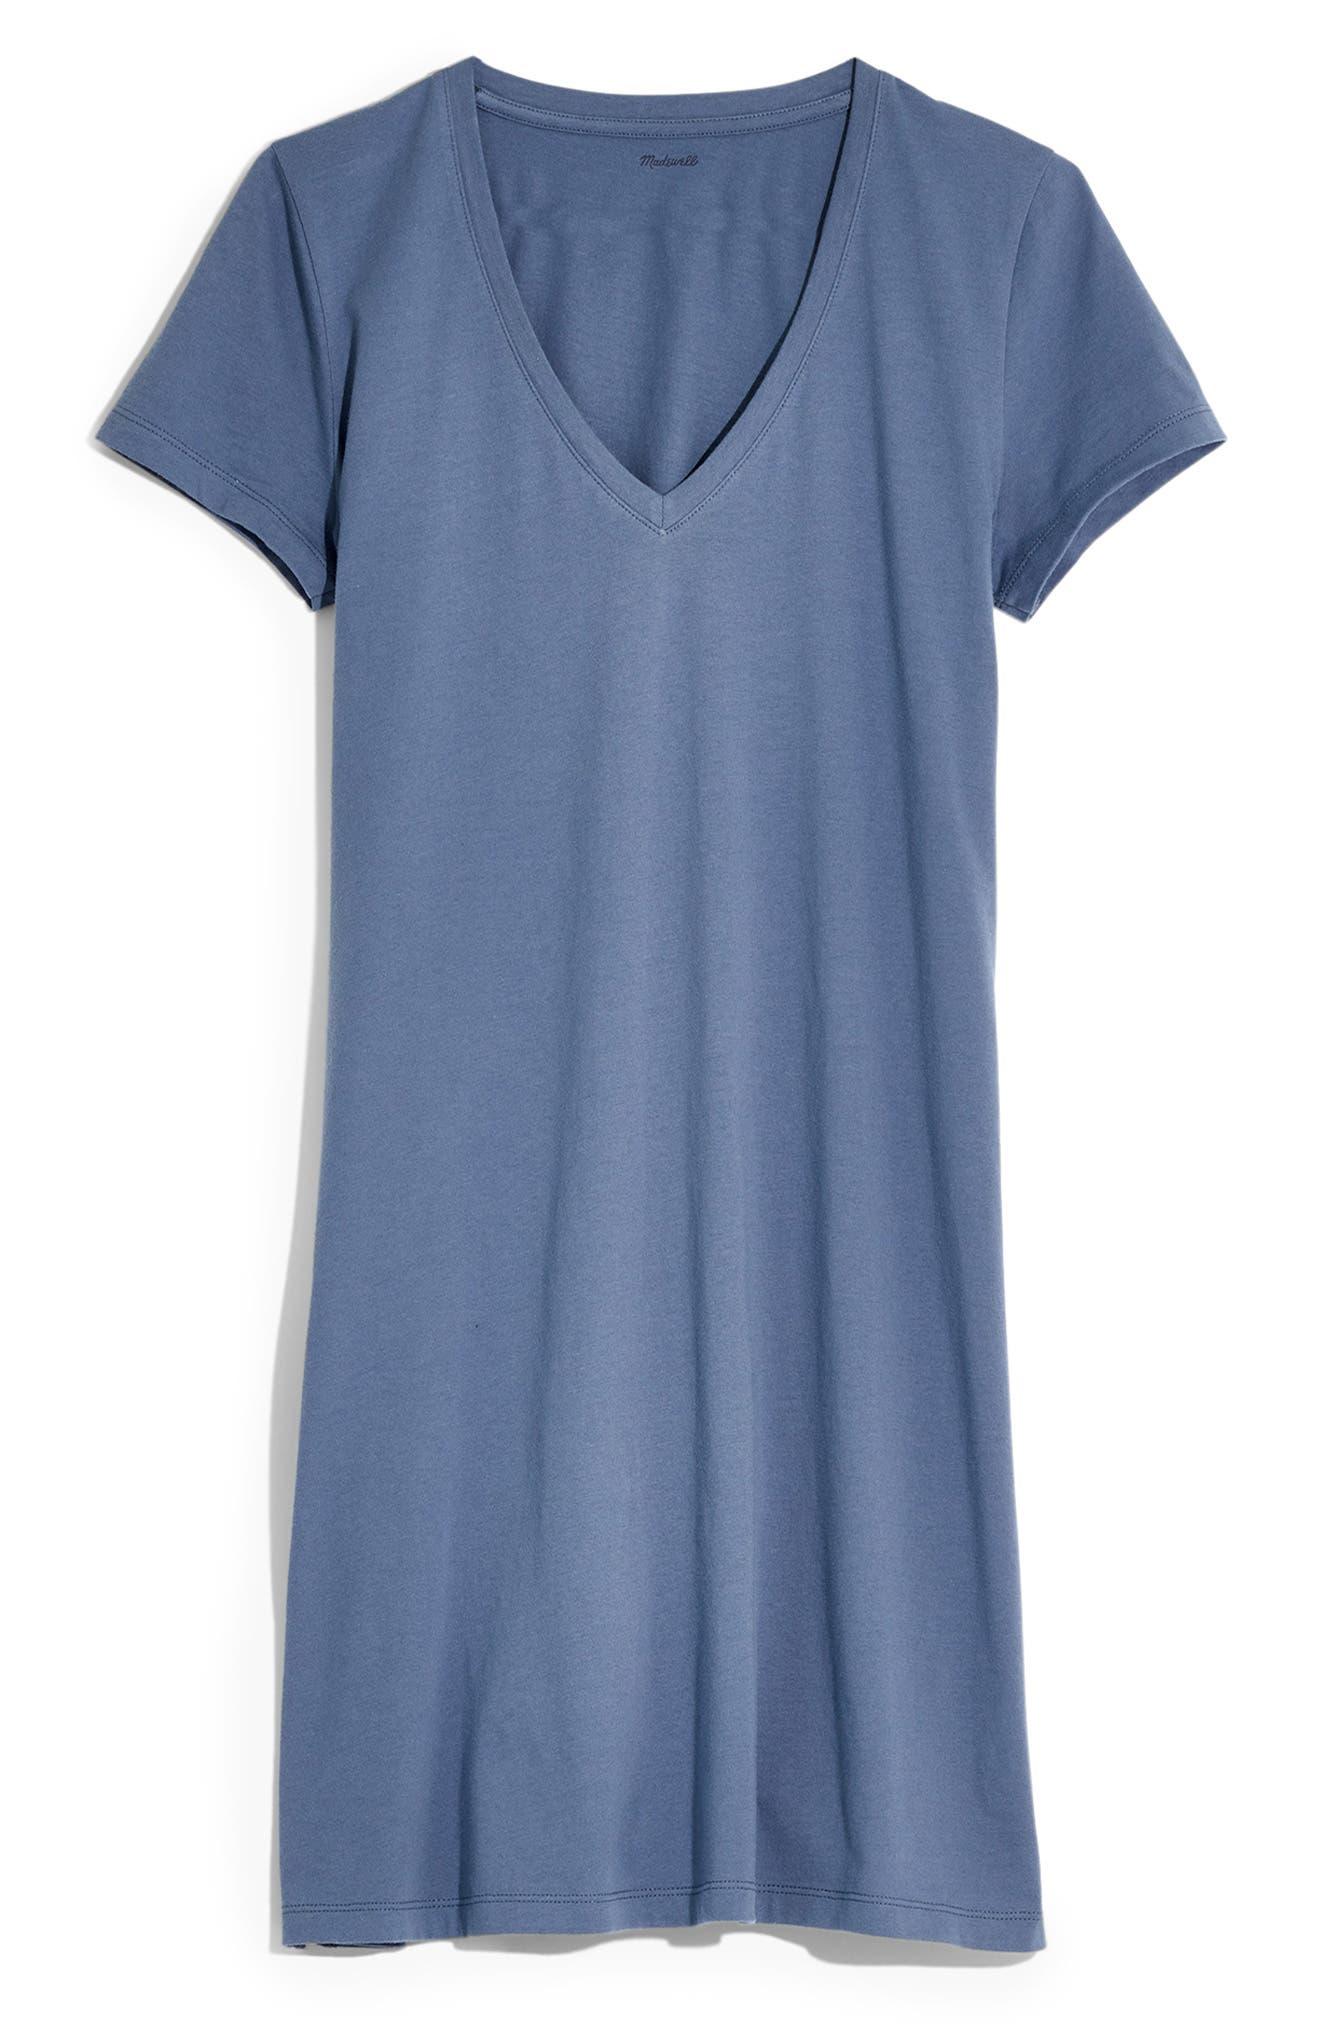 MADEWELL, Northside V-Neck T-Shirt Dress, Alternate thumbnail 5, color, PALE SHADOW